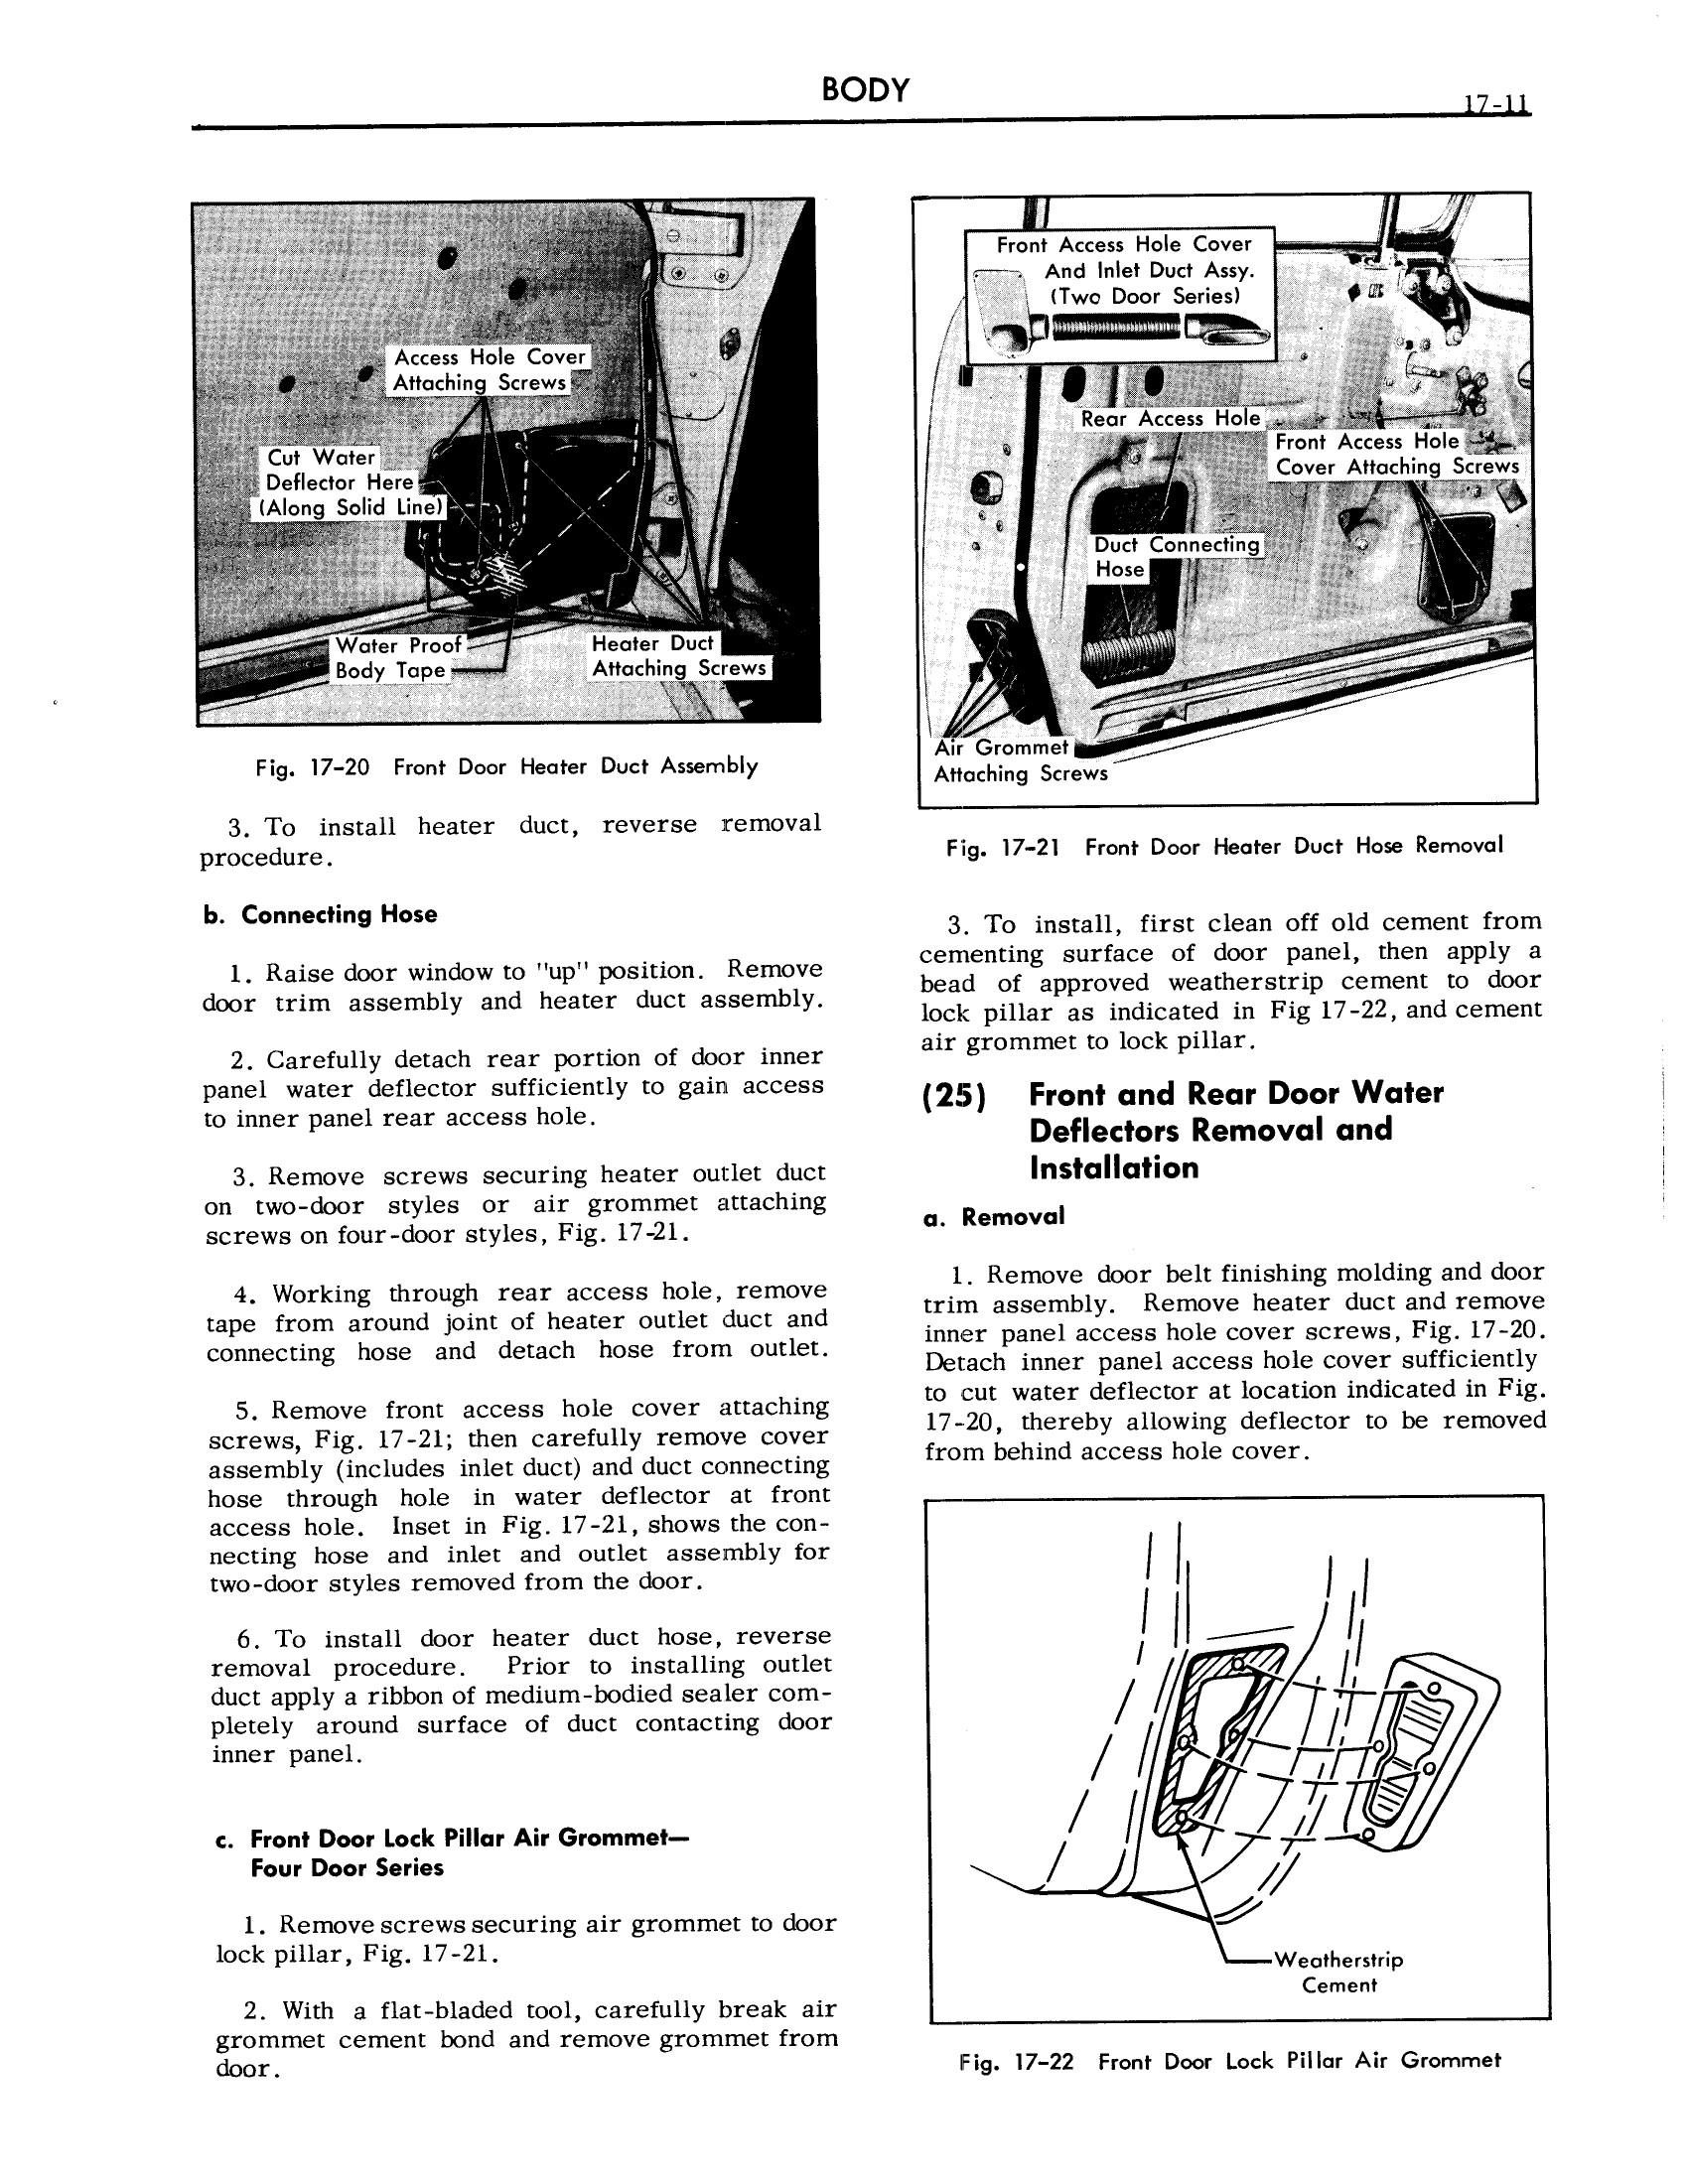 1957 Cadillac Shop Manual- Body Page 11 of 76